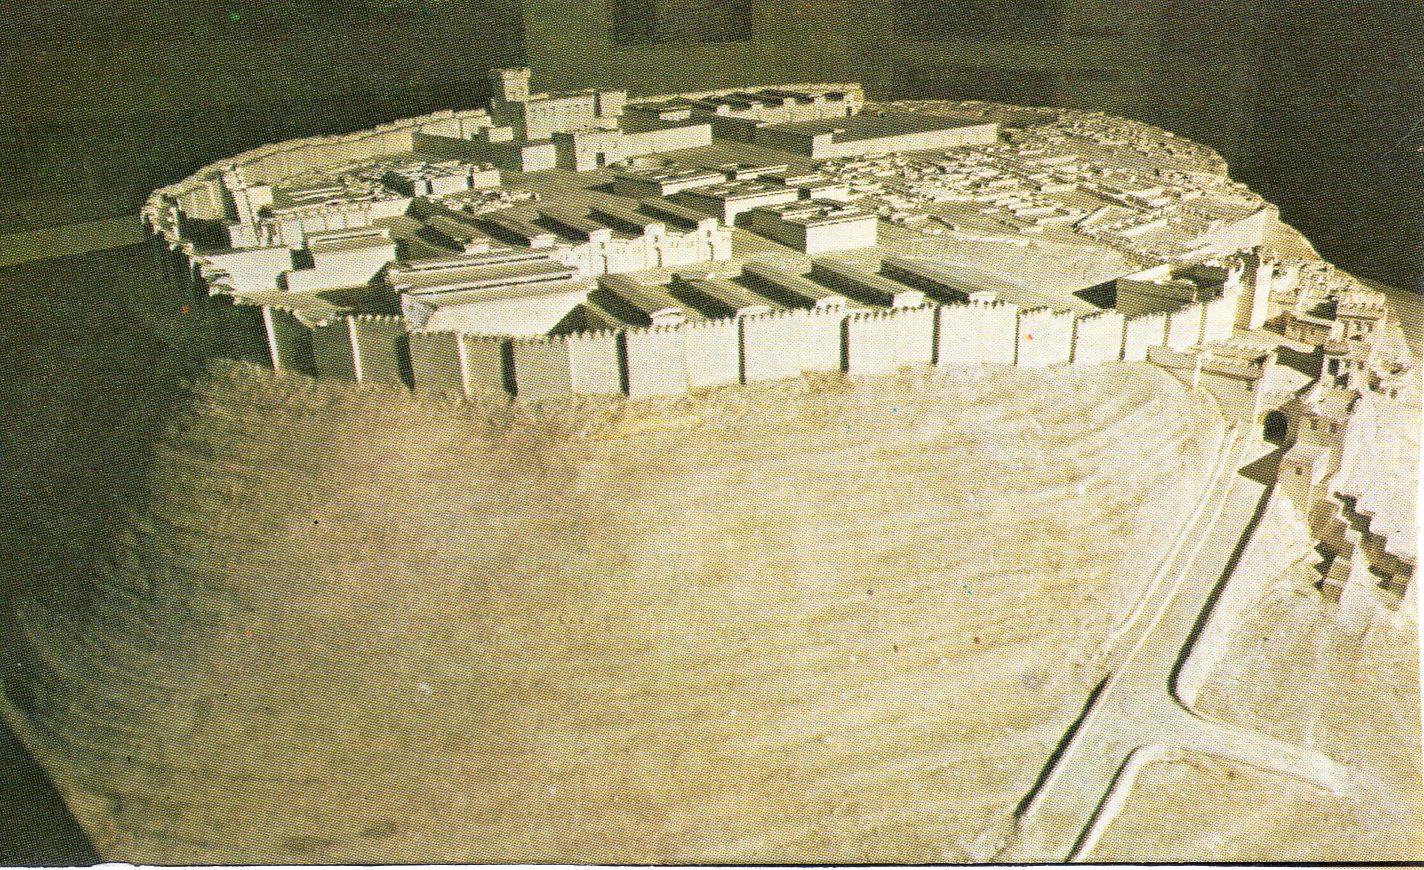 Model of Megiddo, 1457bce. Image from Wikipedia.